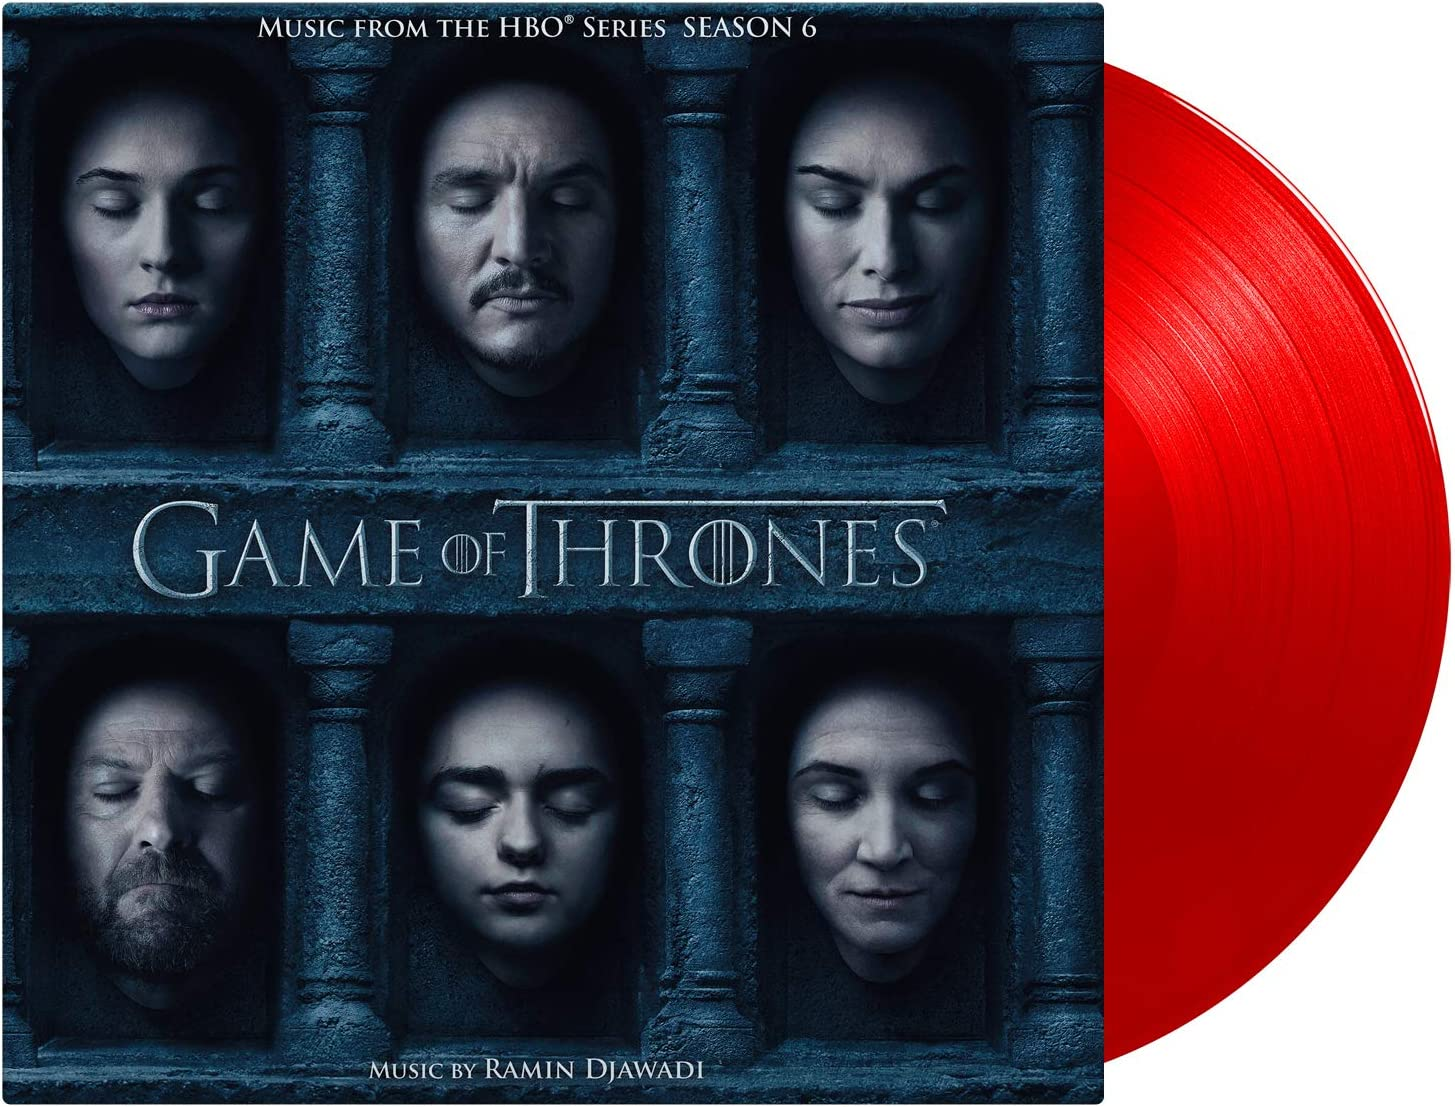 Game Of Thrones Season 6 Music From The Hbo Series Disco De Vinil Amazon Com Br